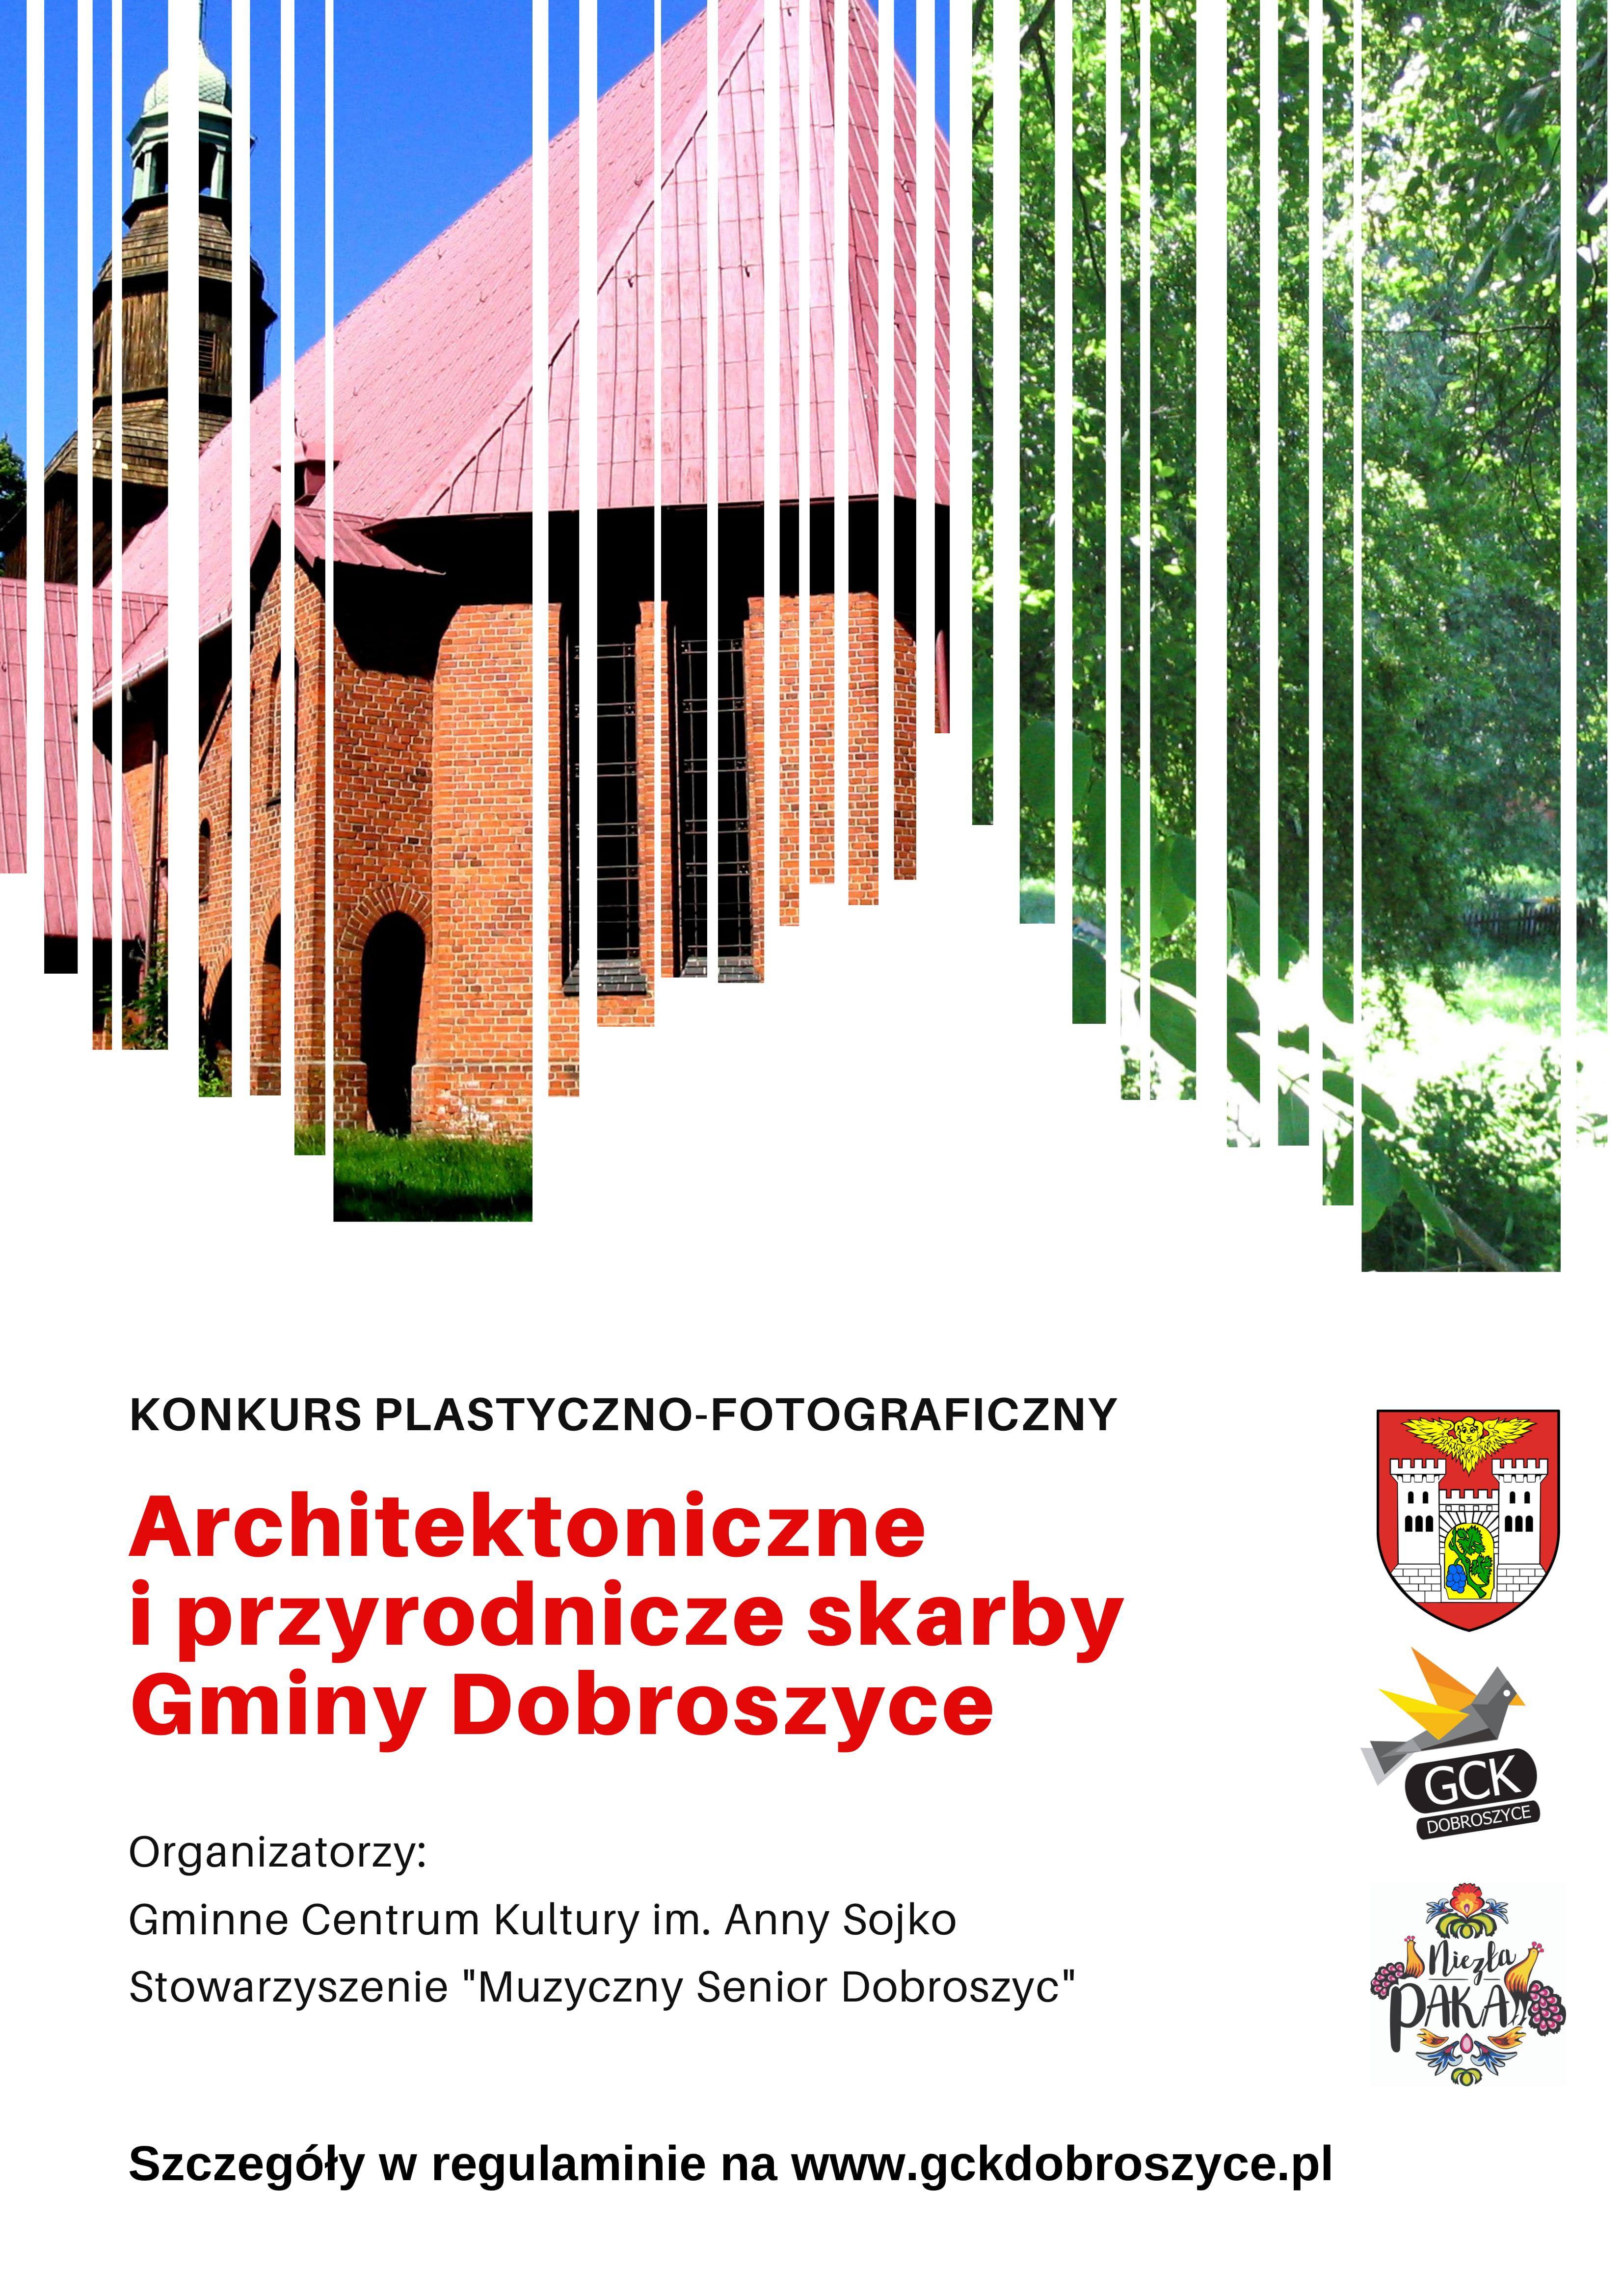 Plakat konkurs plastyczno-fotograficzny-1